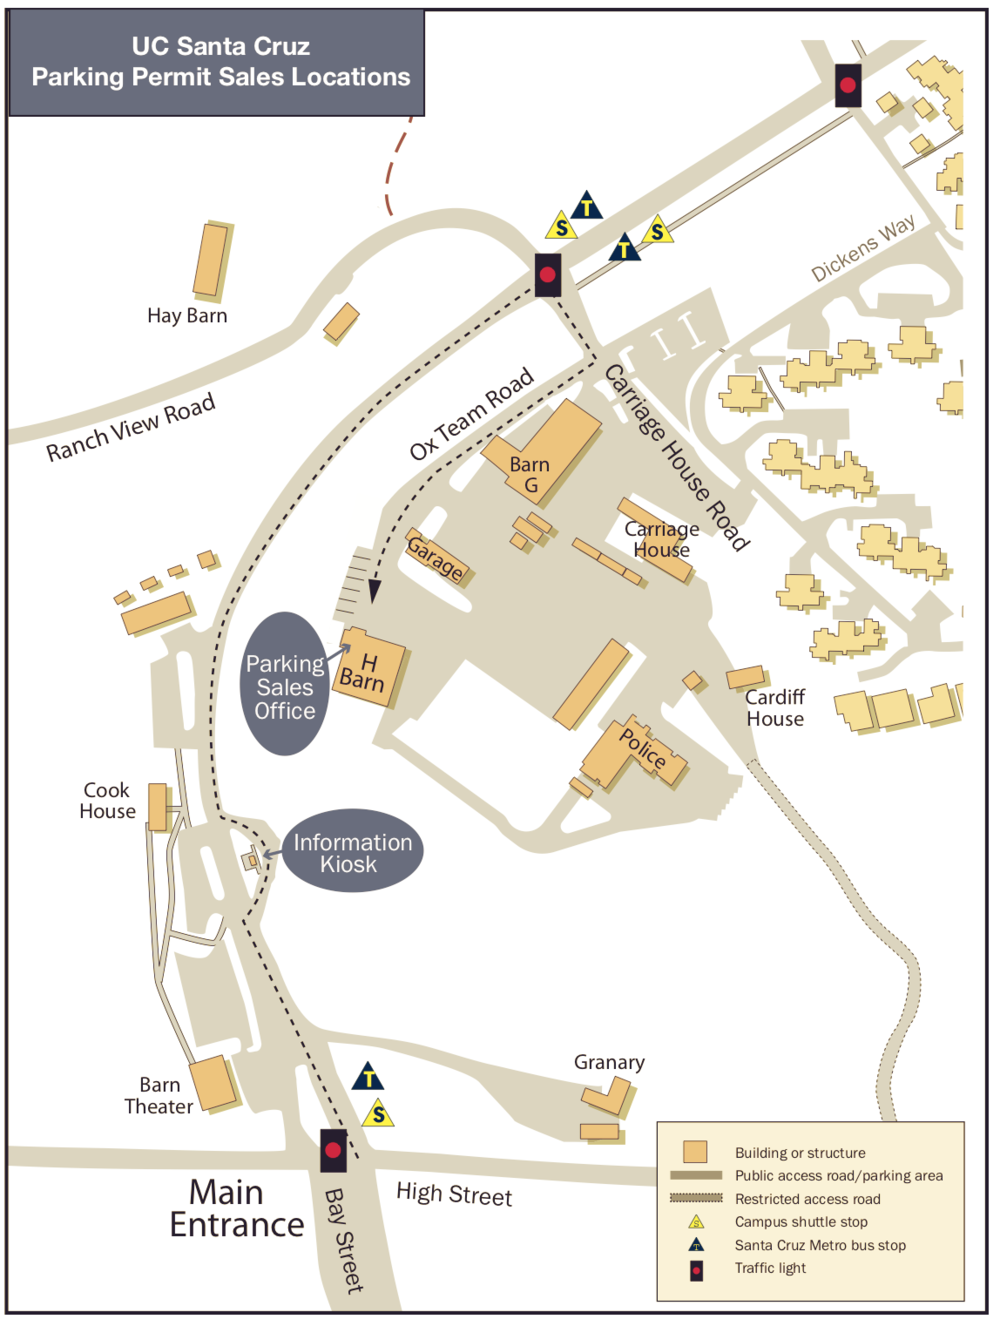 UC Santa Cruz Parking Permit Sales Locations